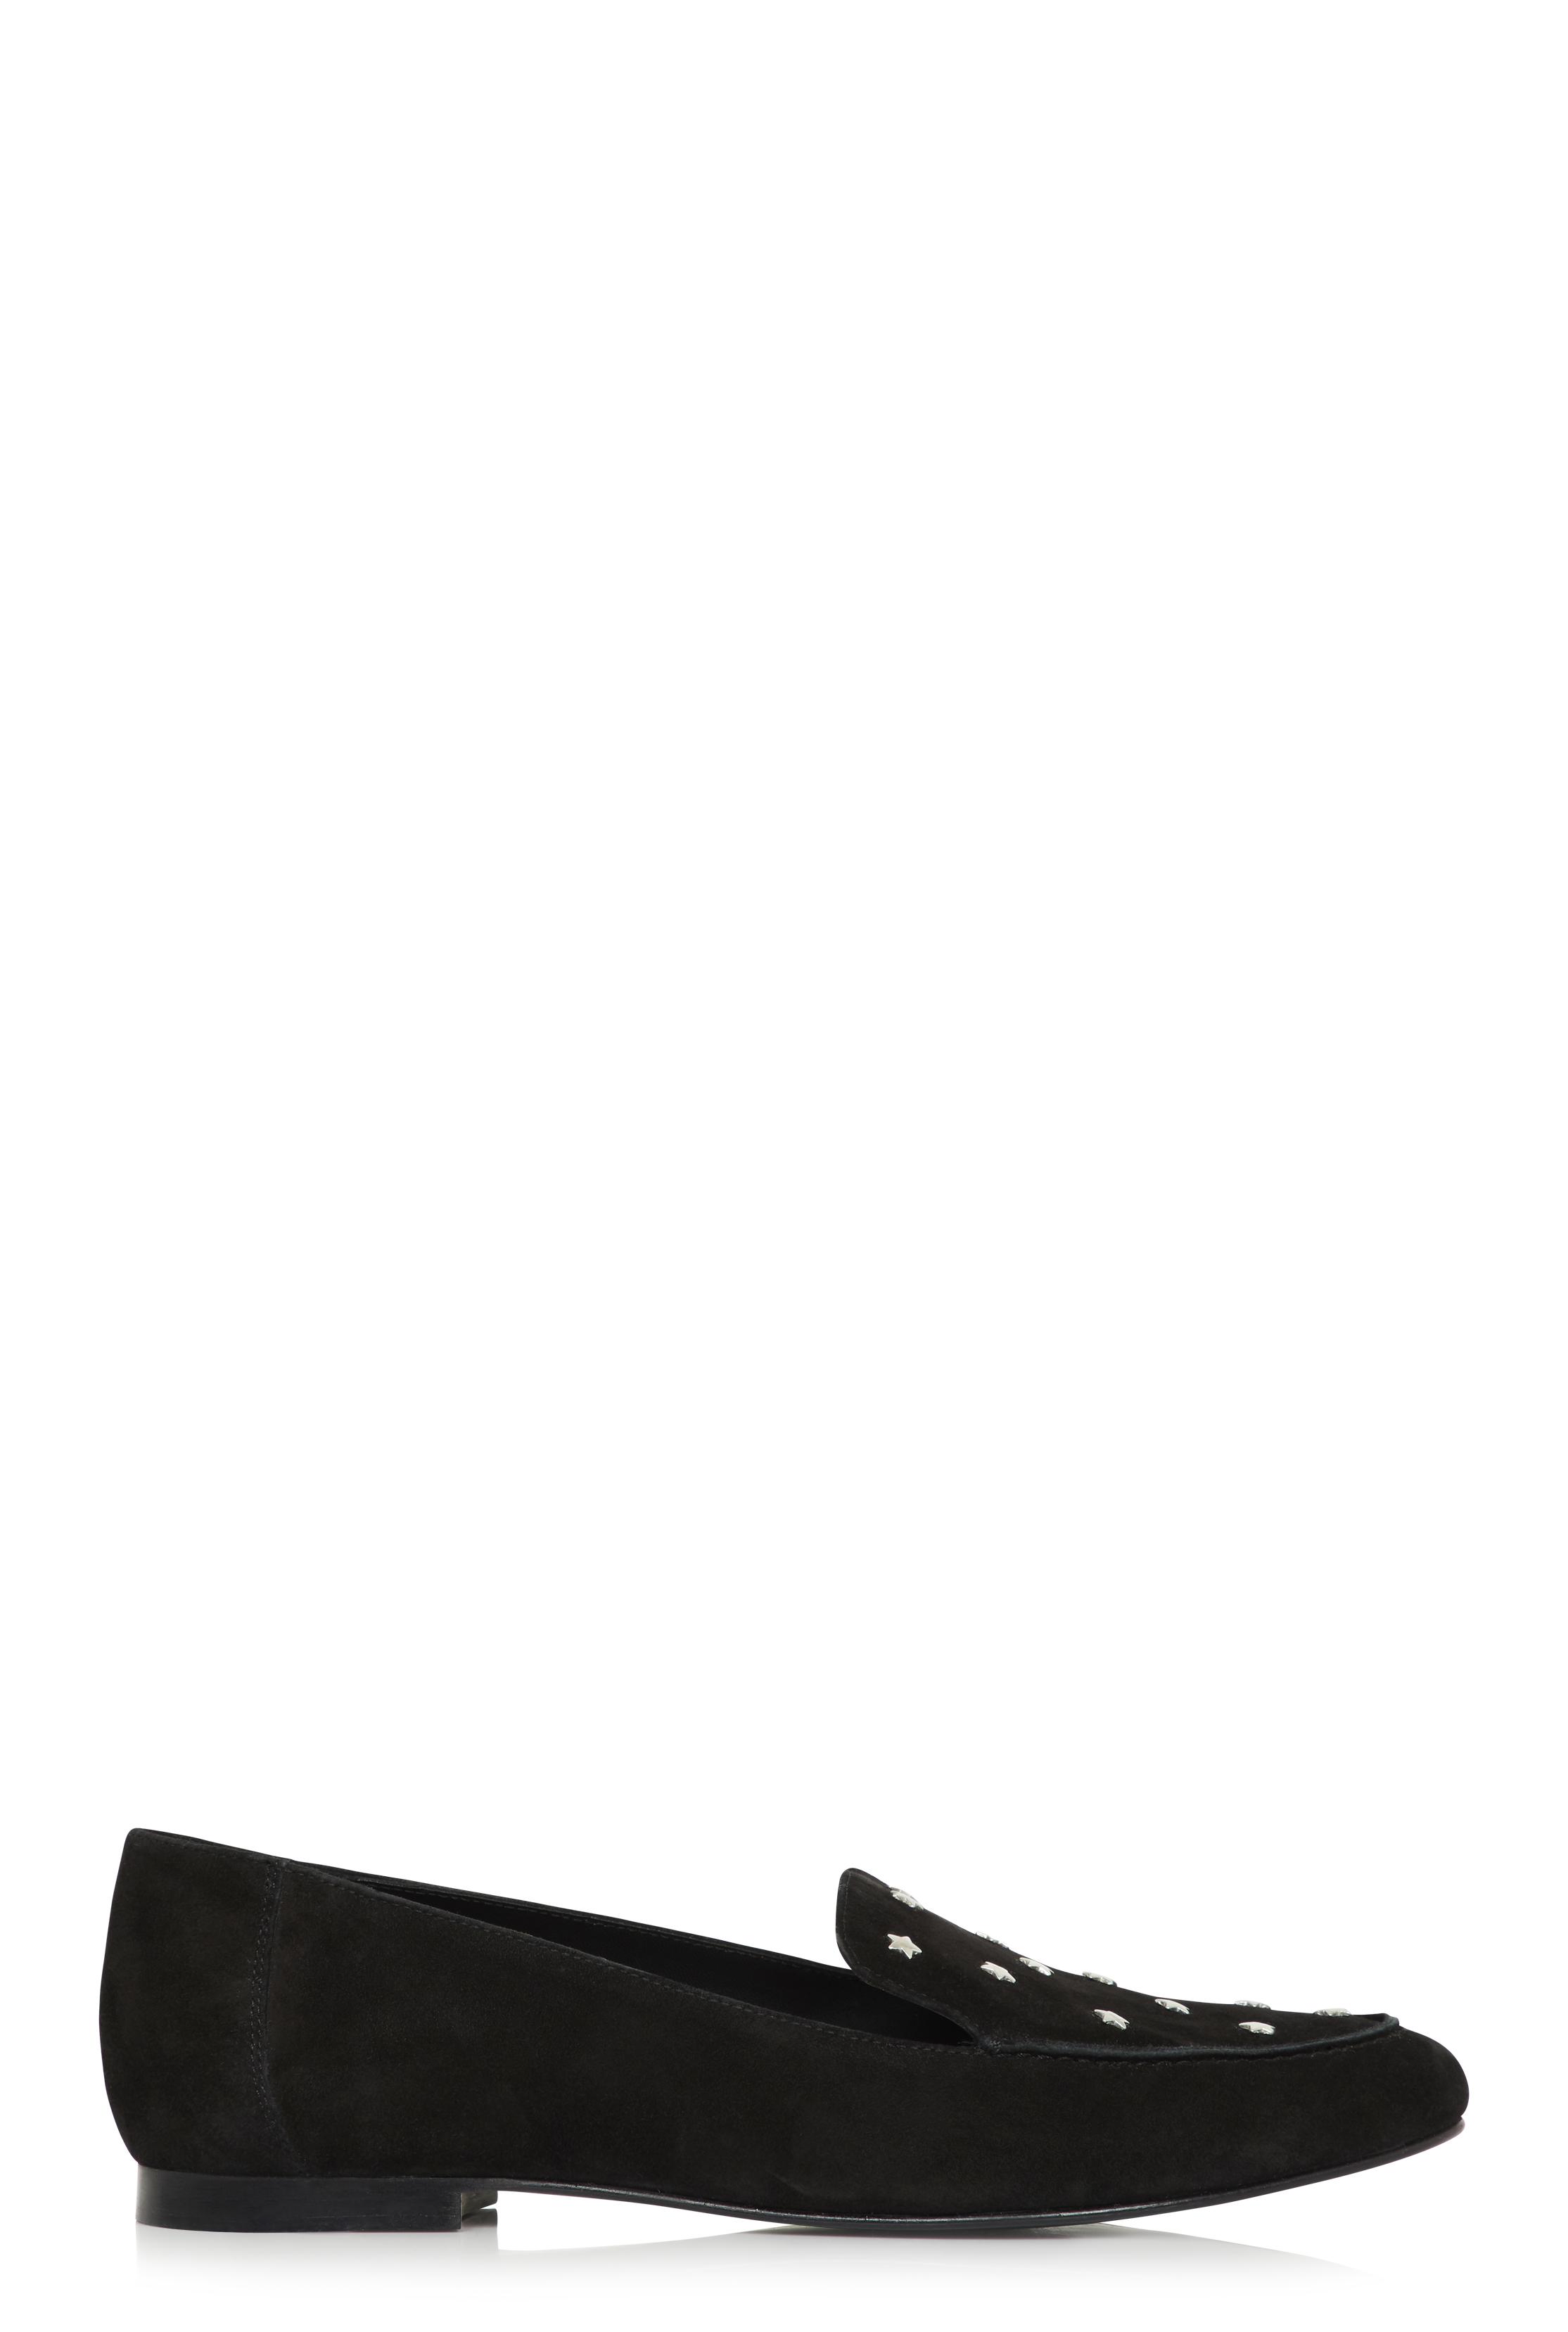 LTS Maeve Star Studded Leather Loafer